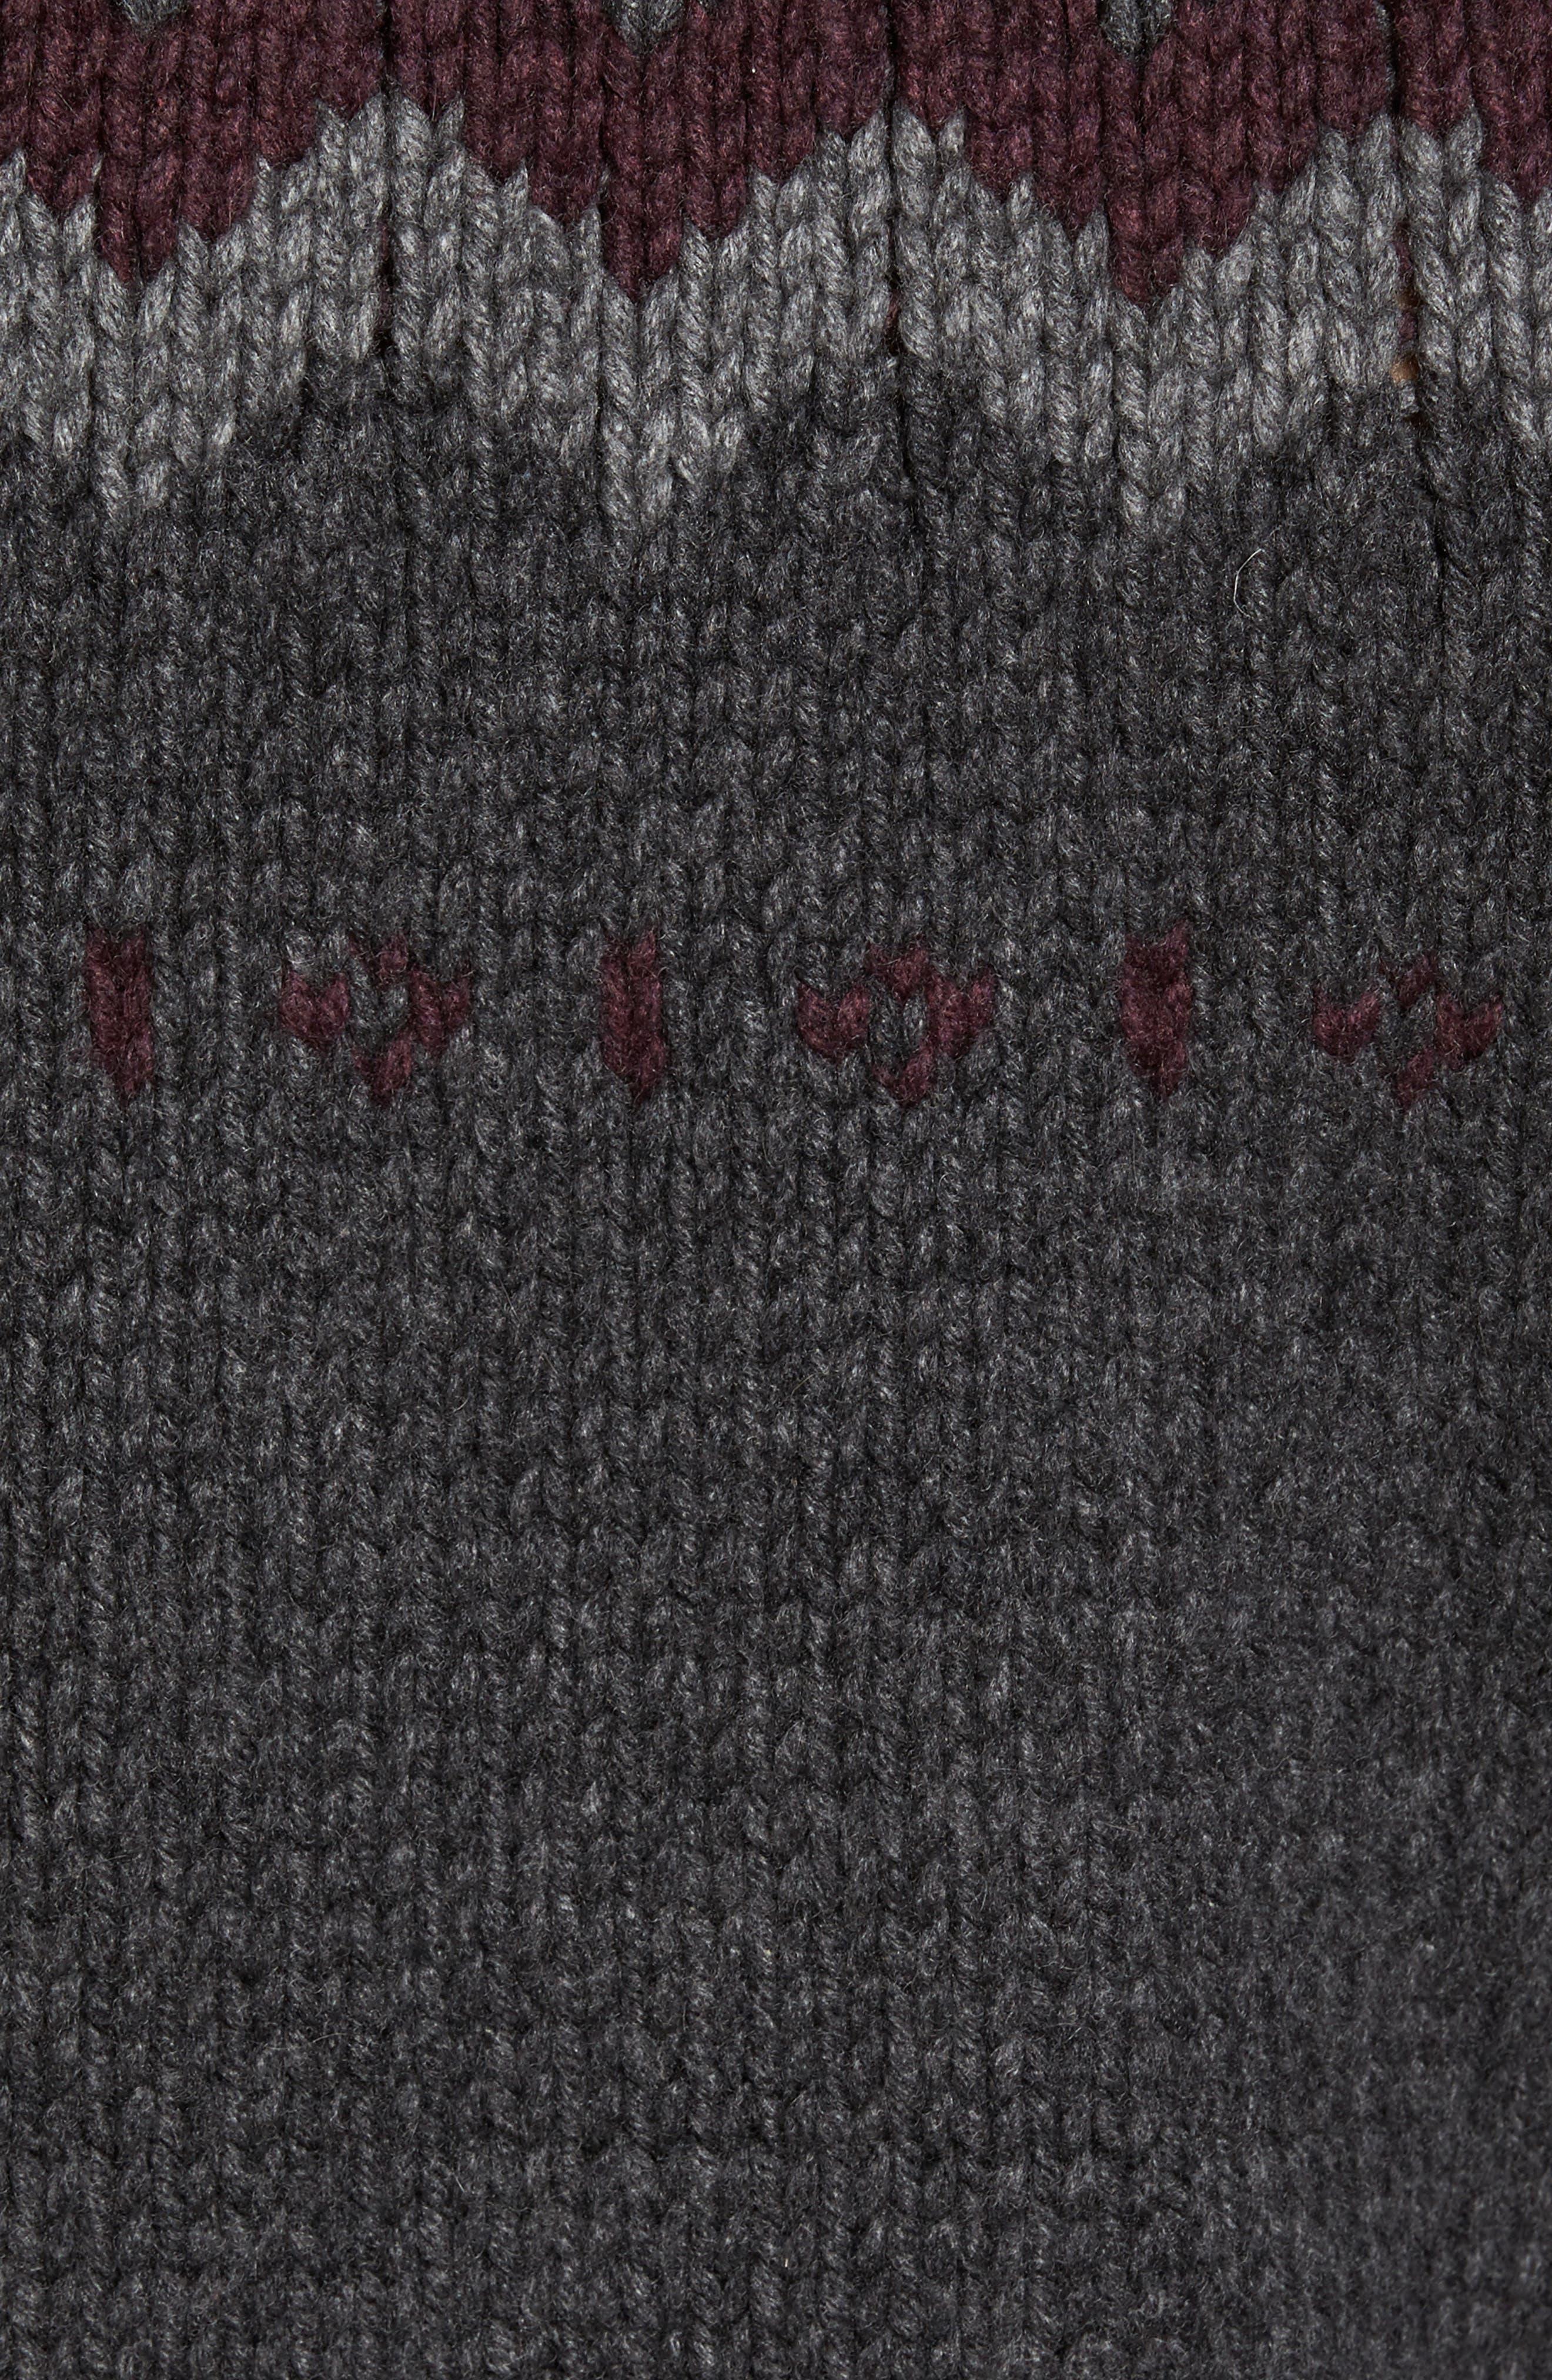 Intarsia Cashmere Sweater,                             Alternate thumbnail 5, color,                             035